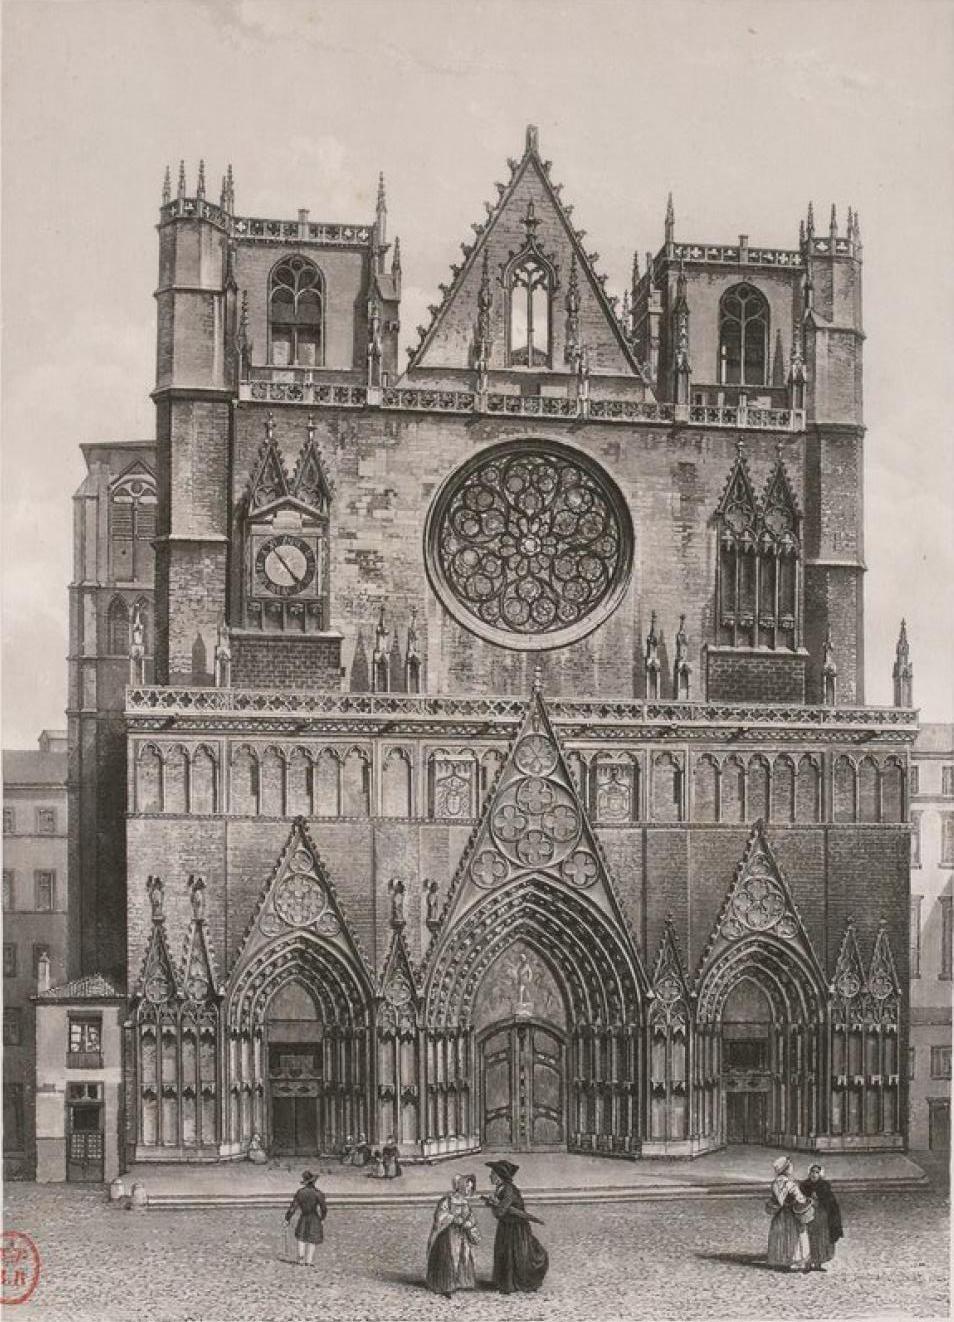 Франция. Лион. Собор Сен-Жан или Собор Иоанна Крестителя